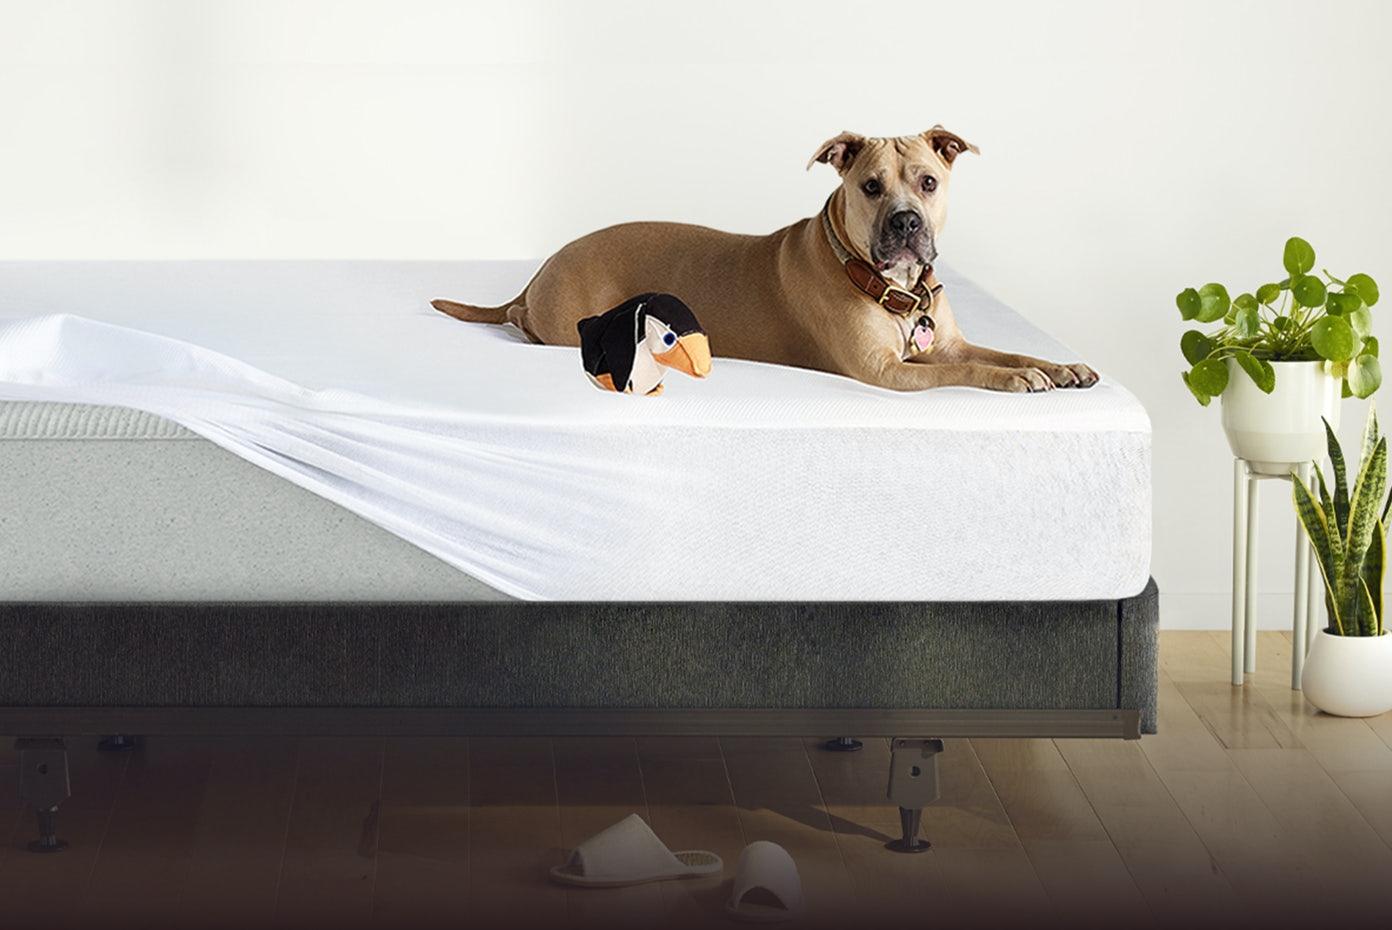 Dog laying on mattress protector on Casper Original Mattress and foundation